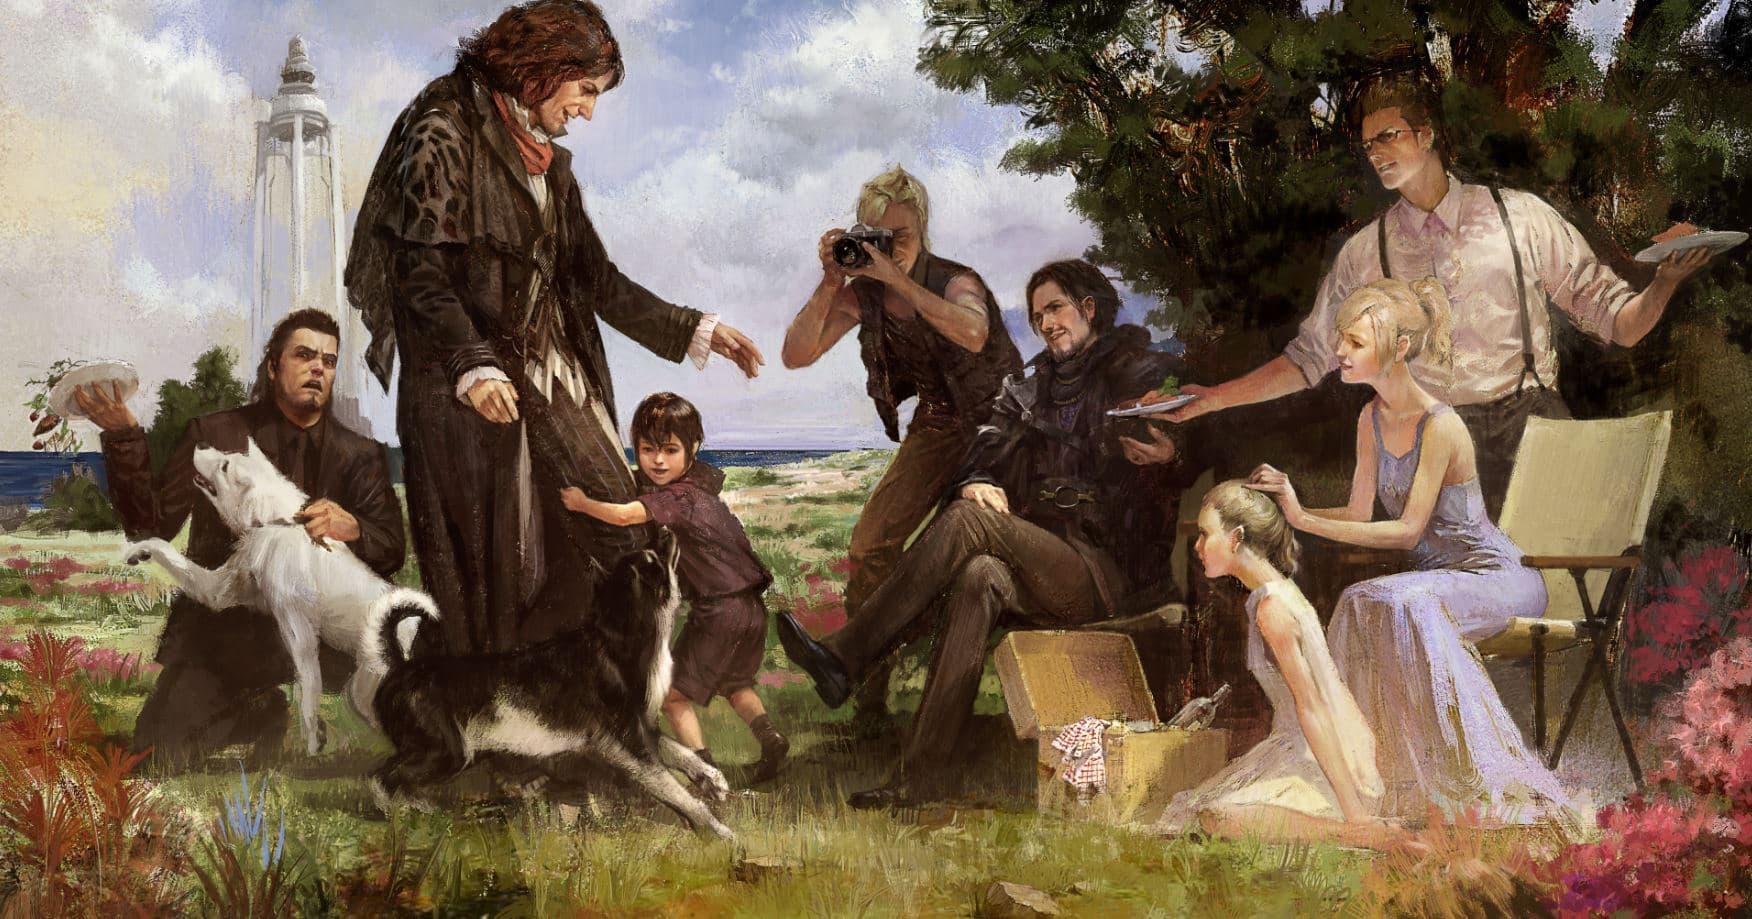 Final Fantasy XV - Episode II: Lunafreya